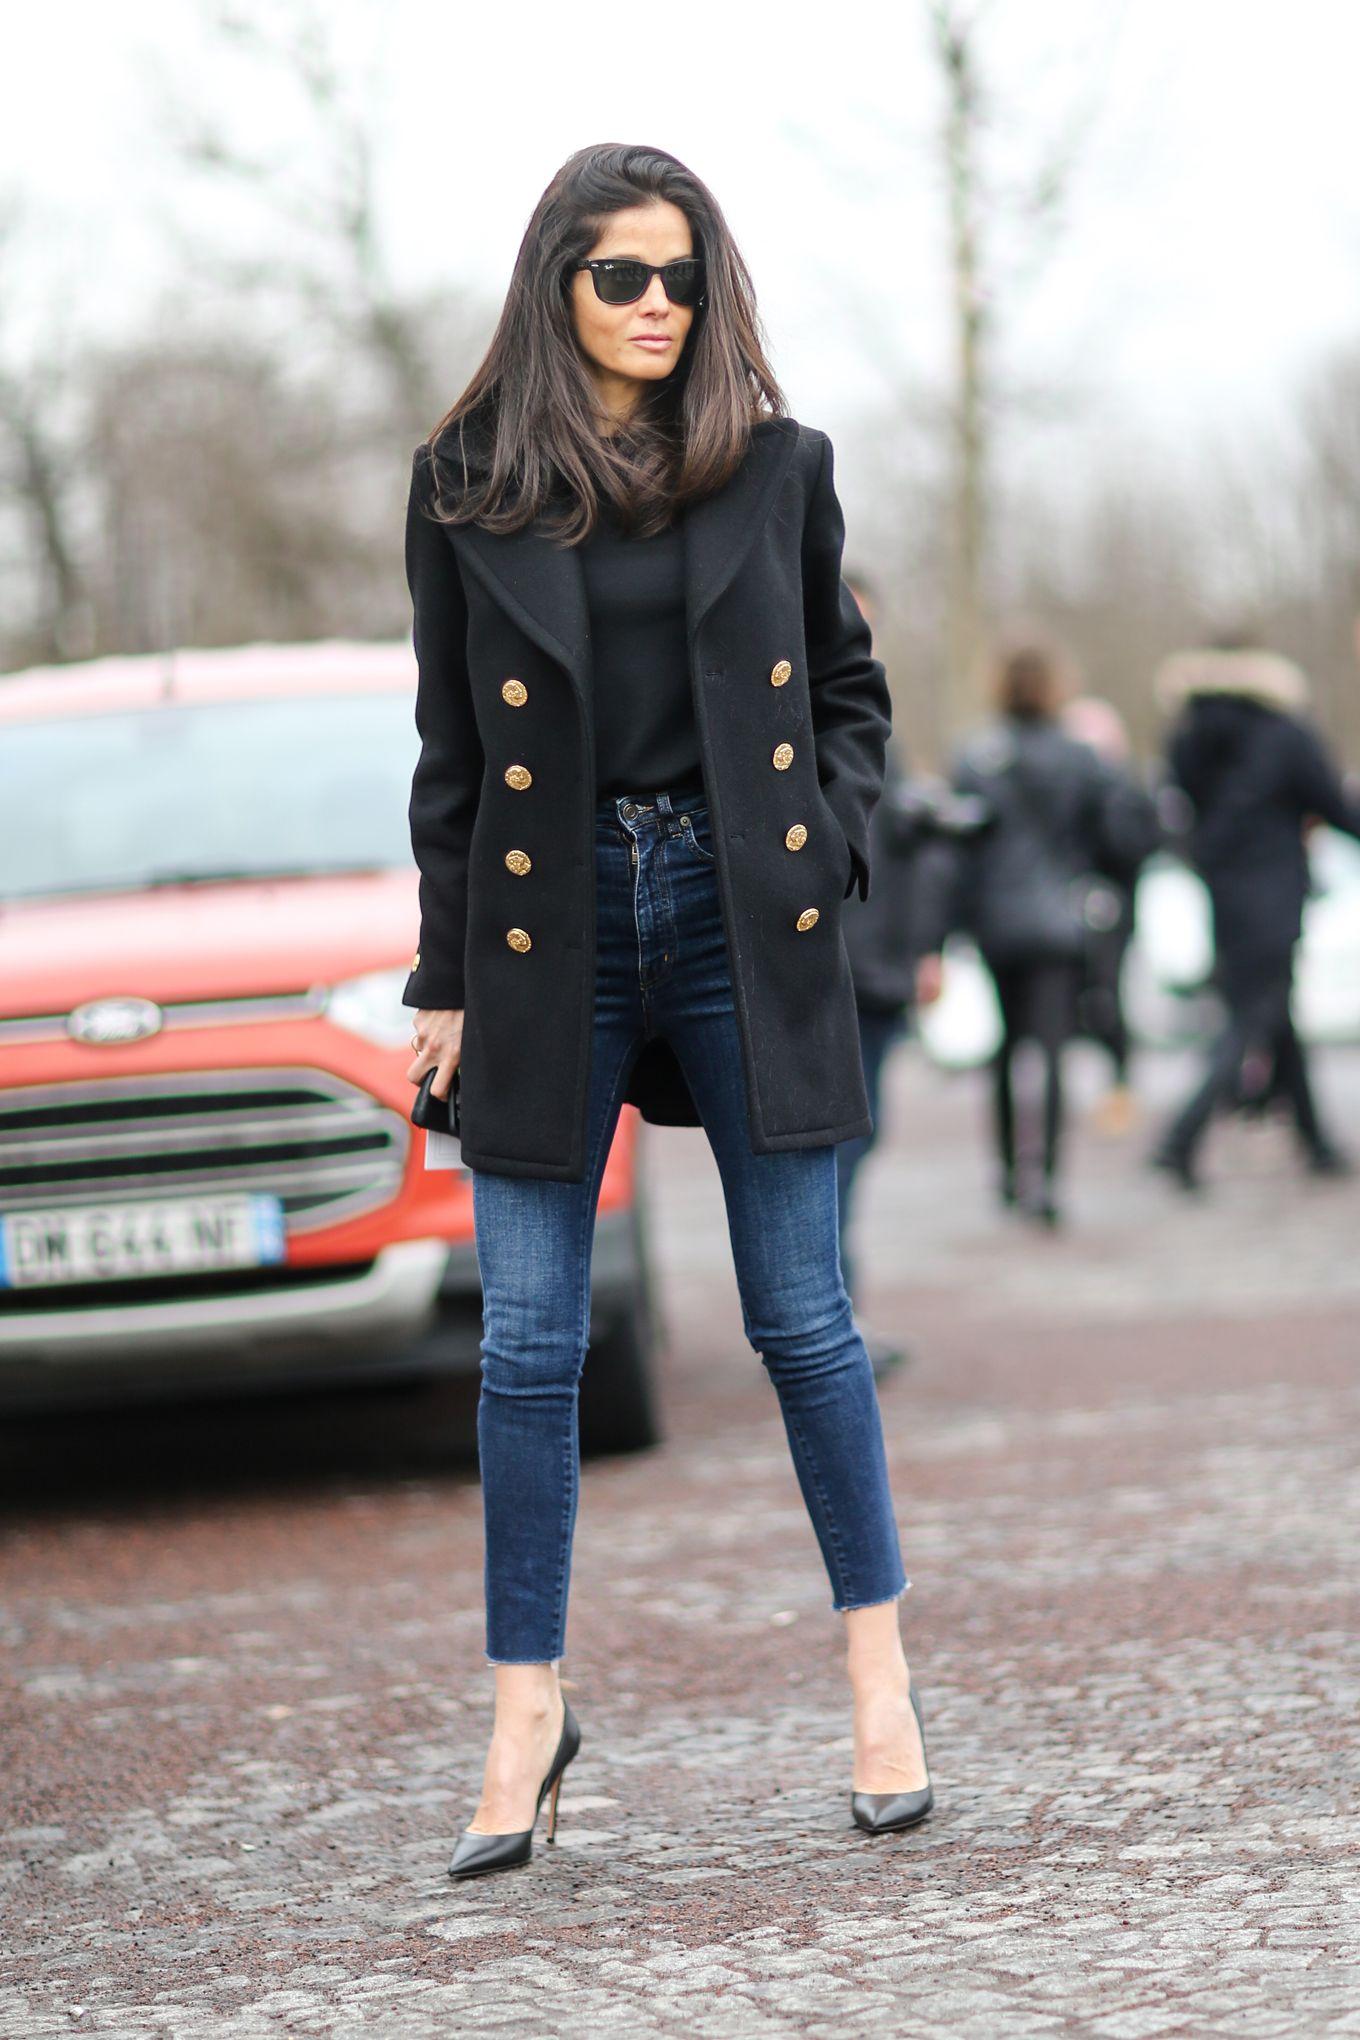 I jeans skinny meglio a vita bassa o a vita alta? Ecco tanti outfit e look